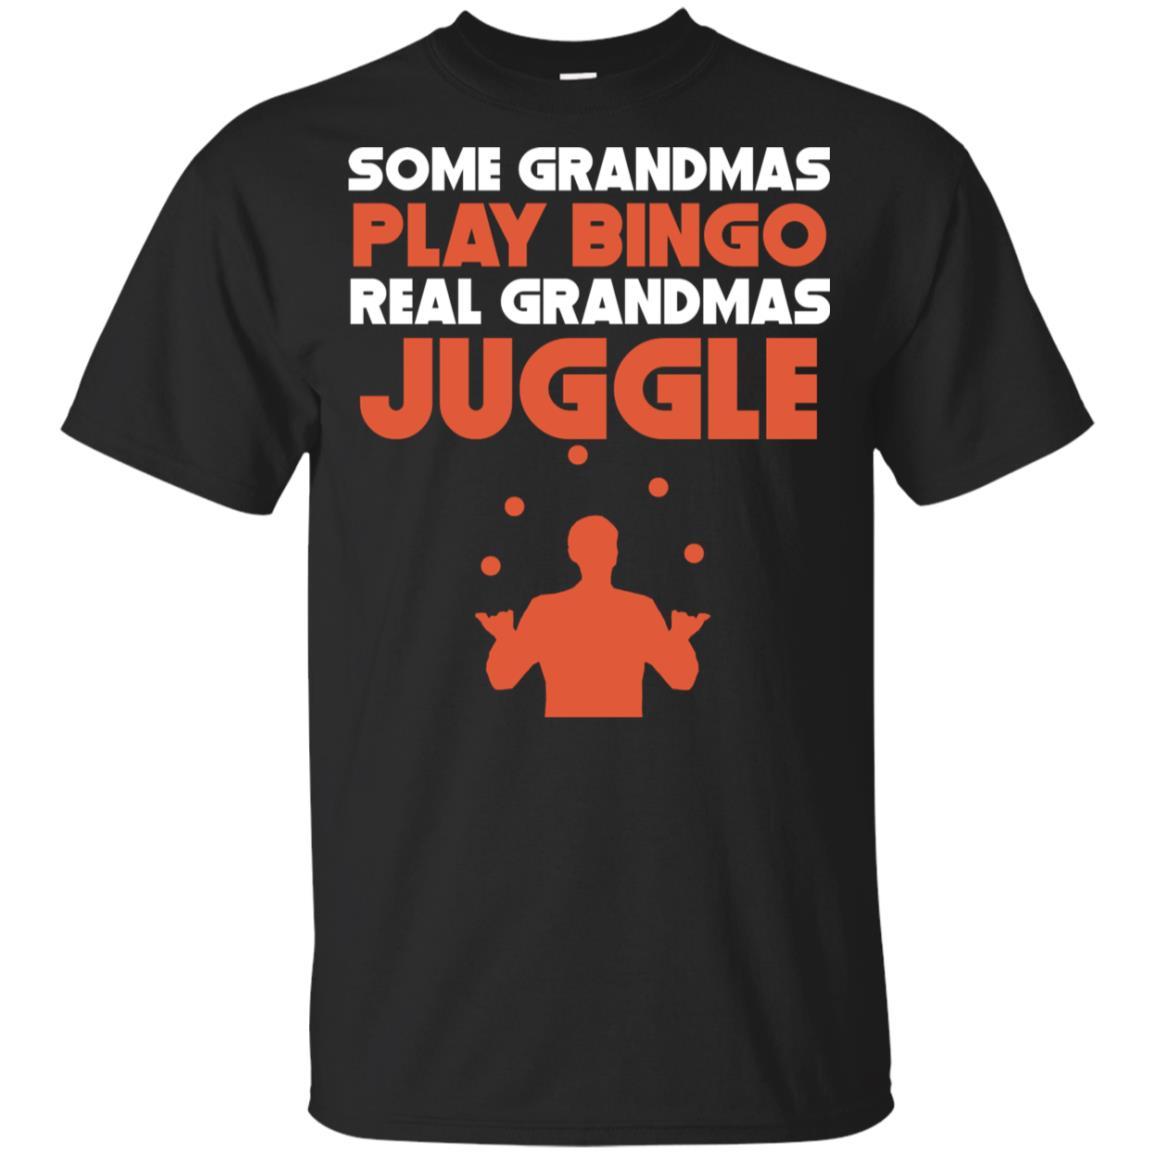 Some Grandmas Play Bingo Real Grandmas Juggle Youth Short Sleeve